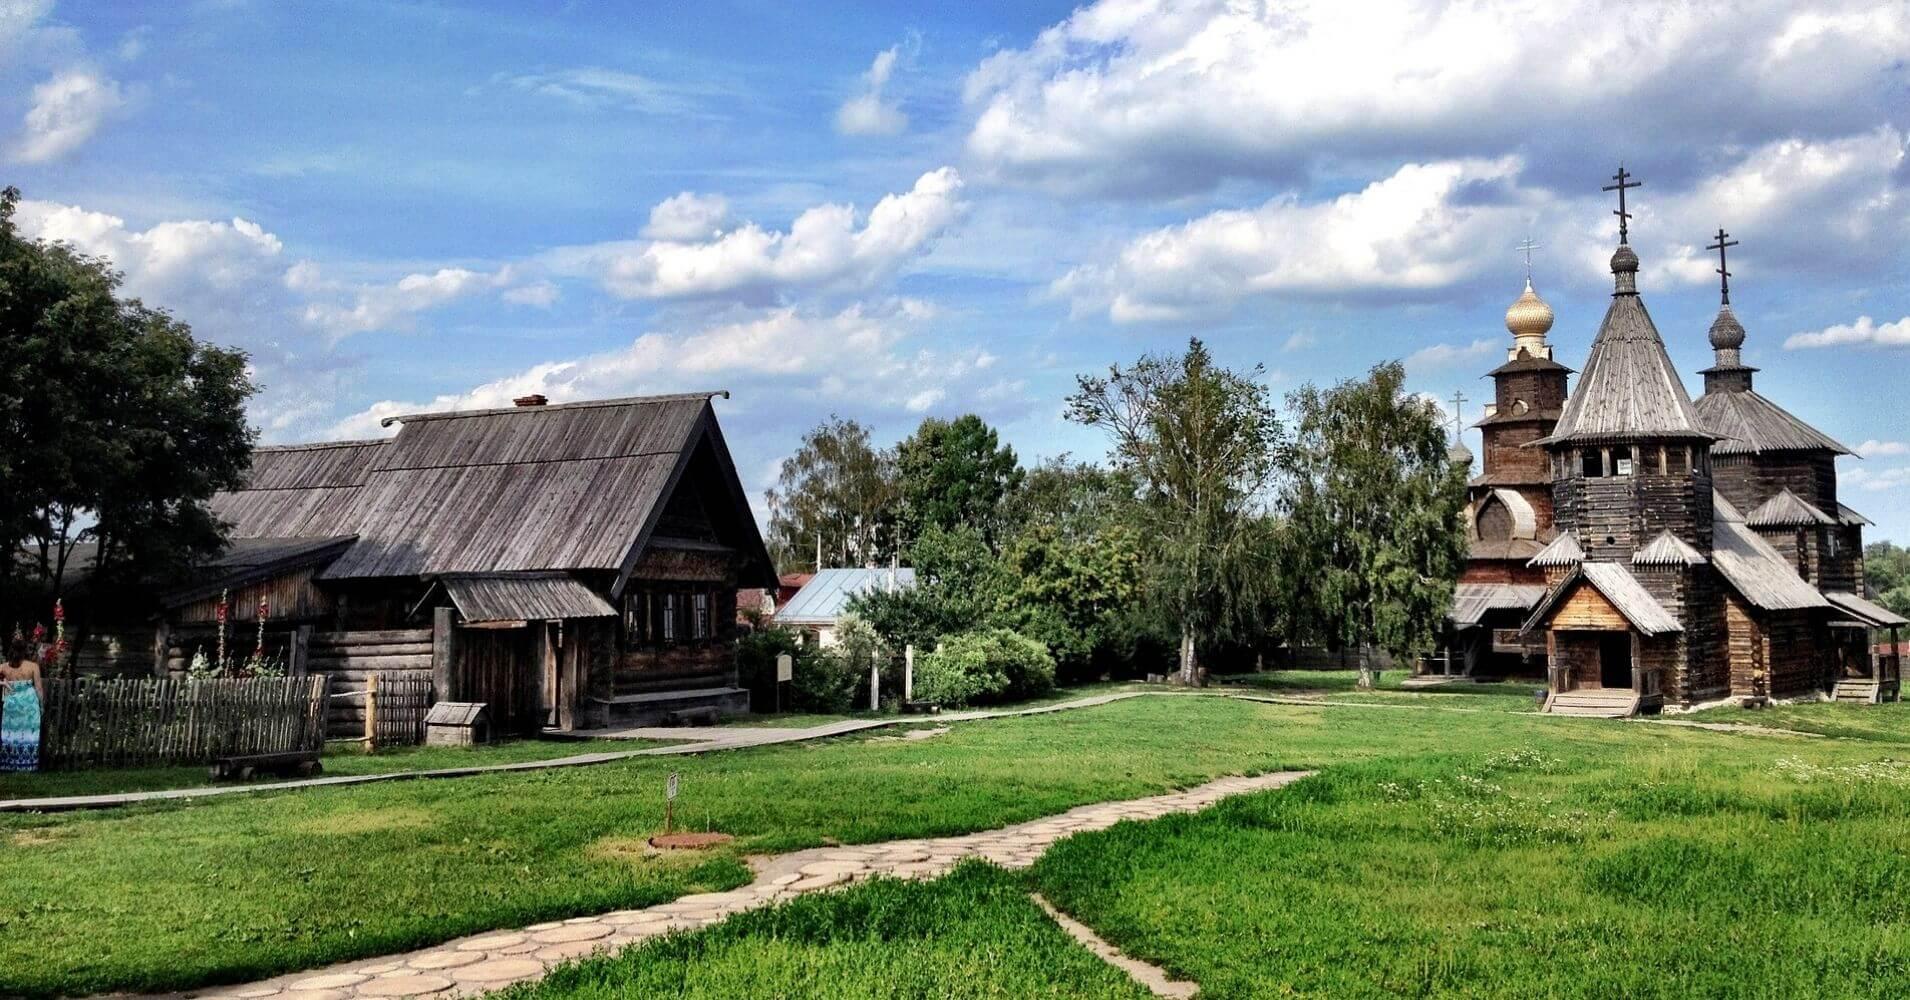 Suzdal, Iglesia de Madera. Viajar a Rusia.